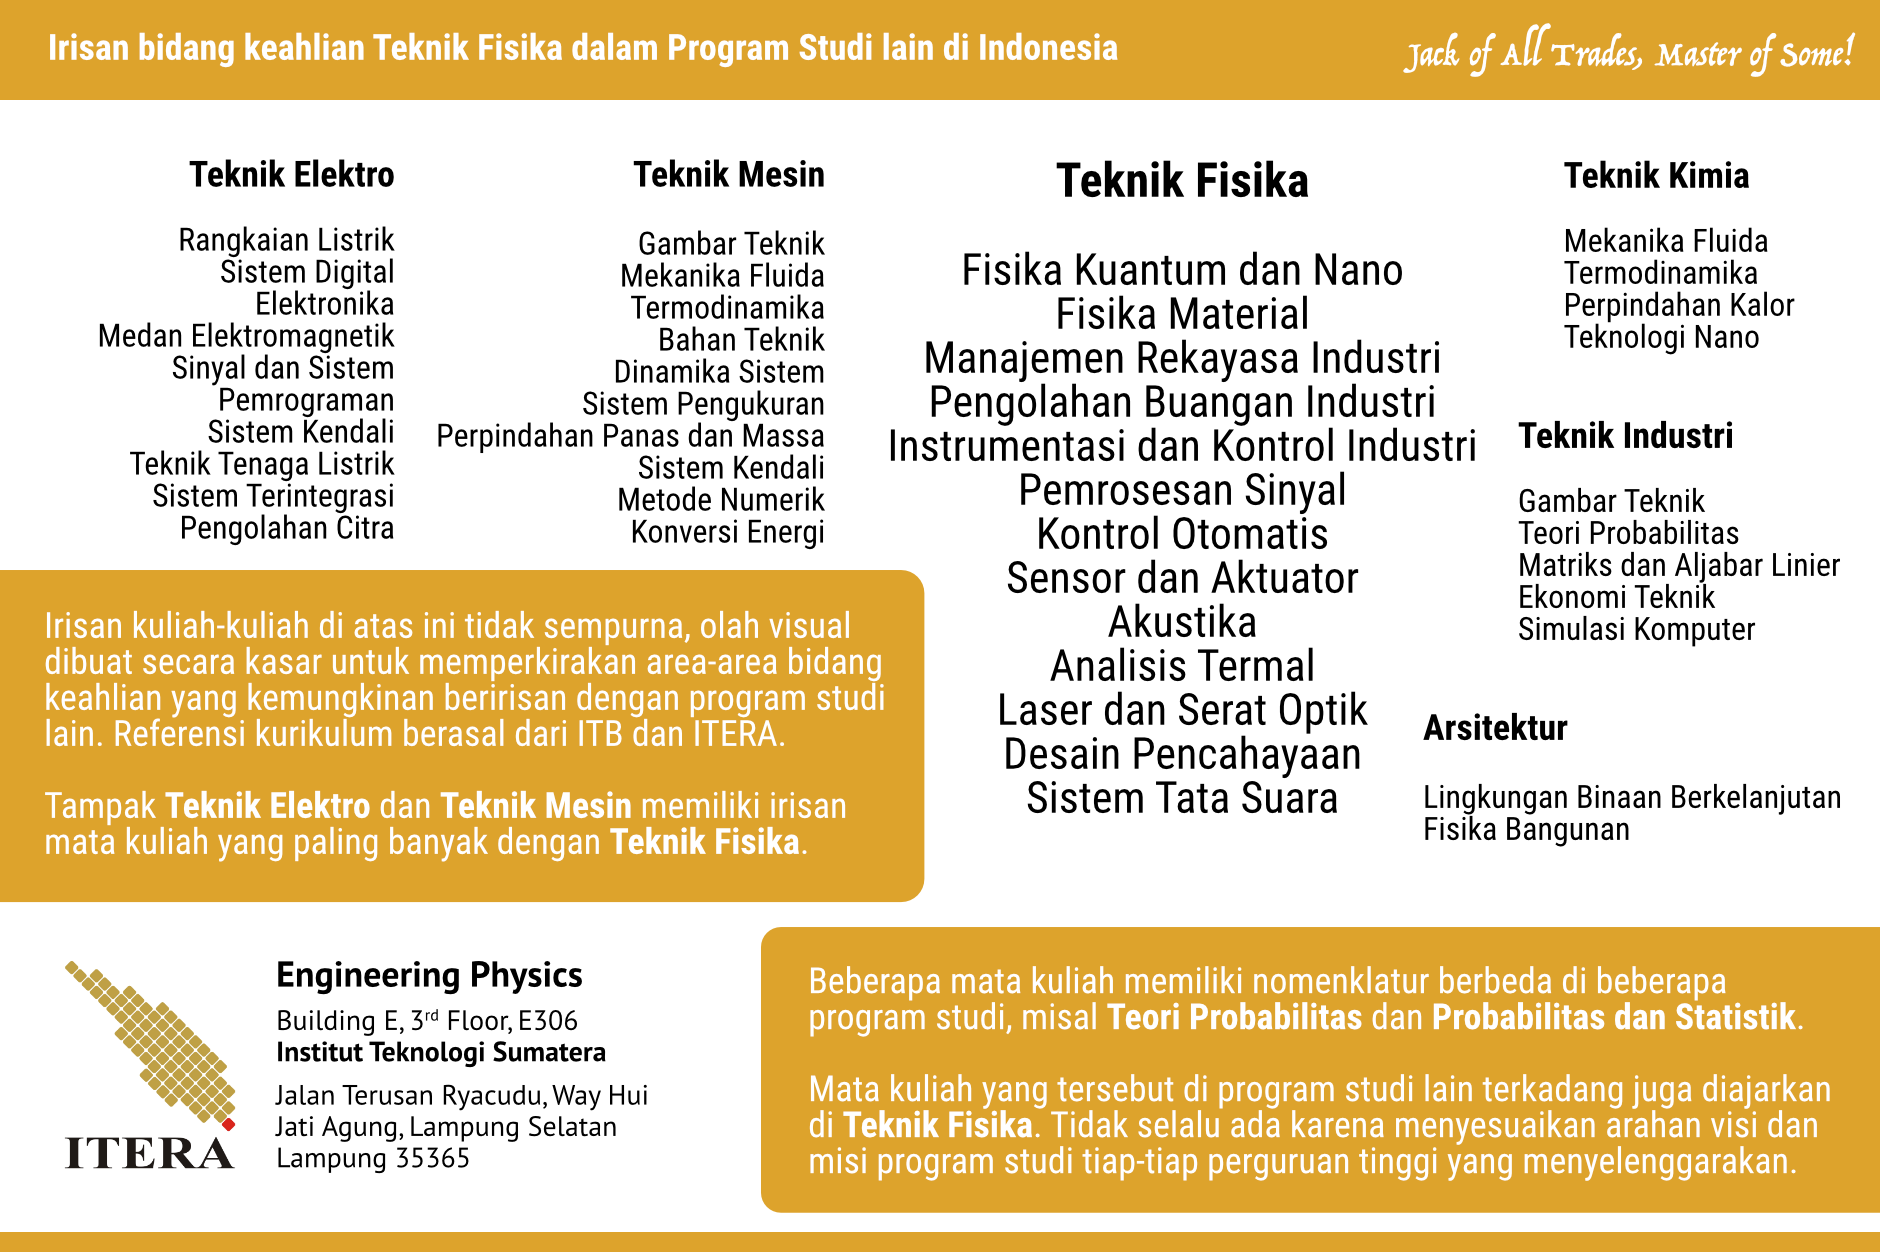 Irisan bidang keahlian Teknik Fisika dalam Program Studi lain di Indonesia.